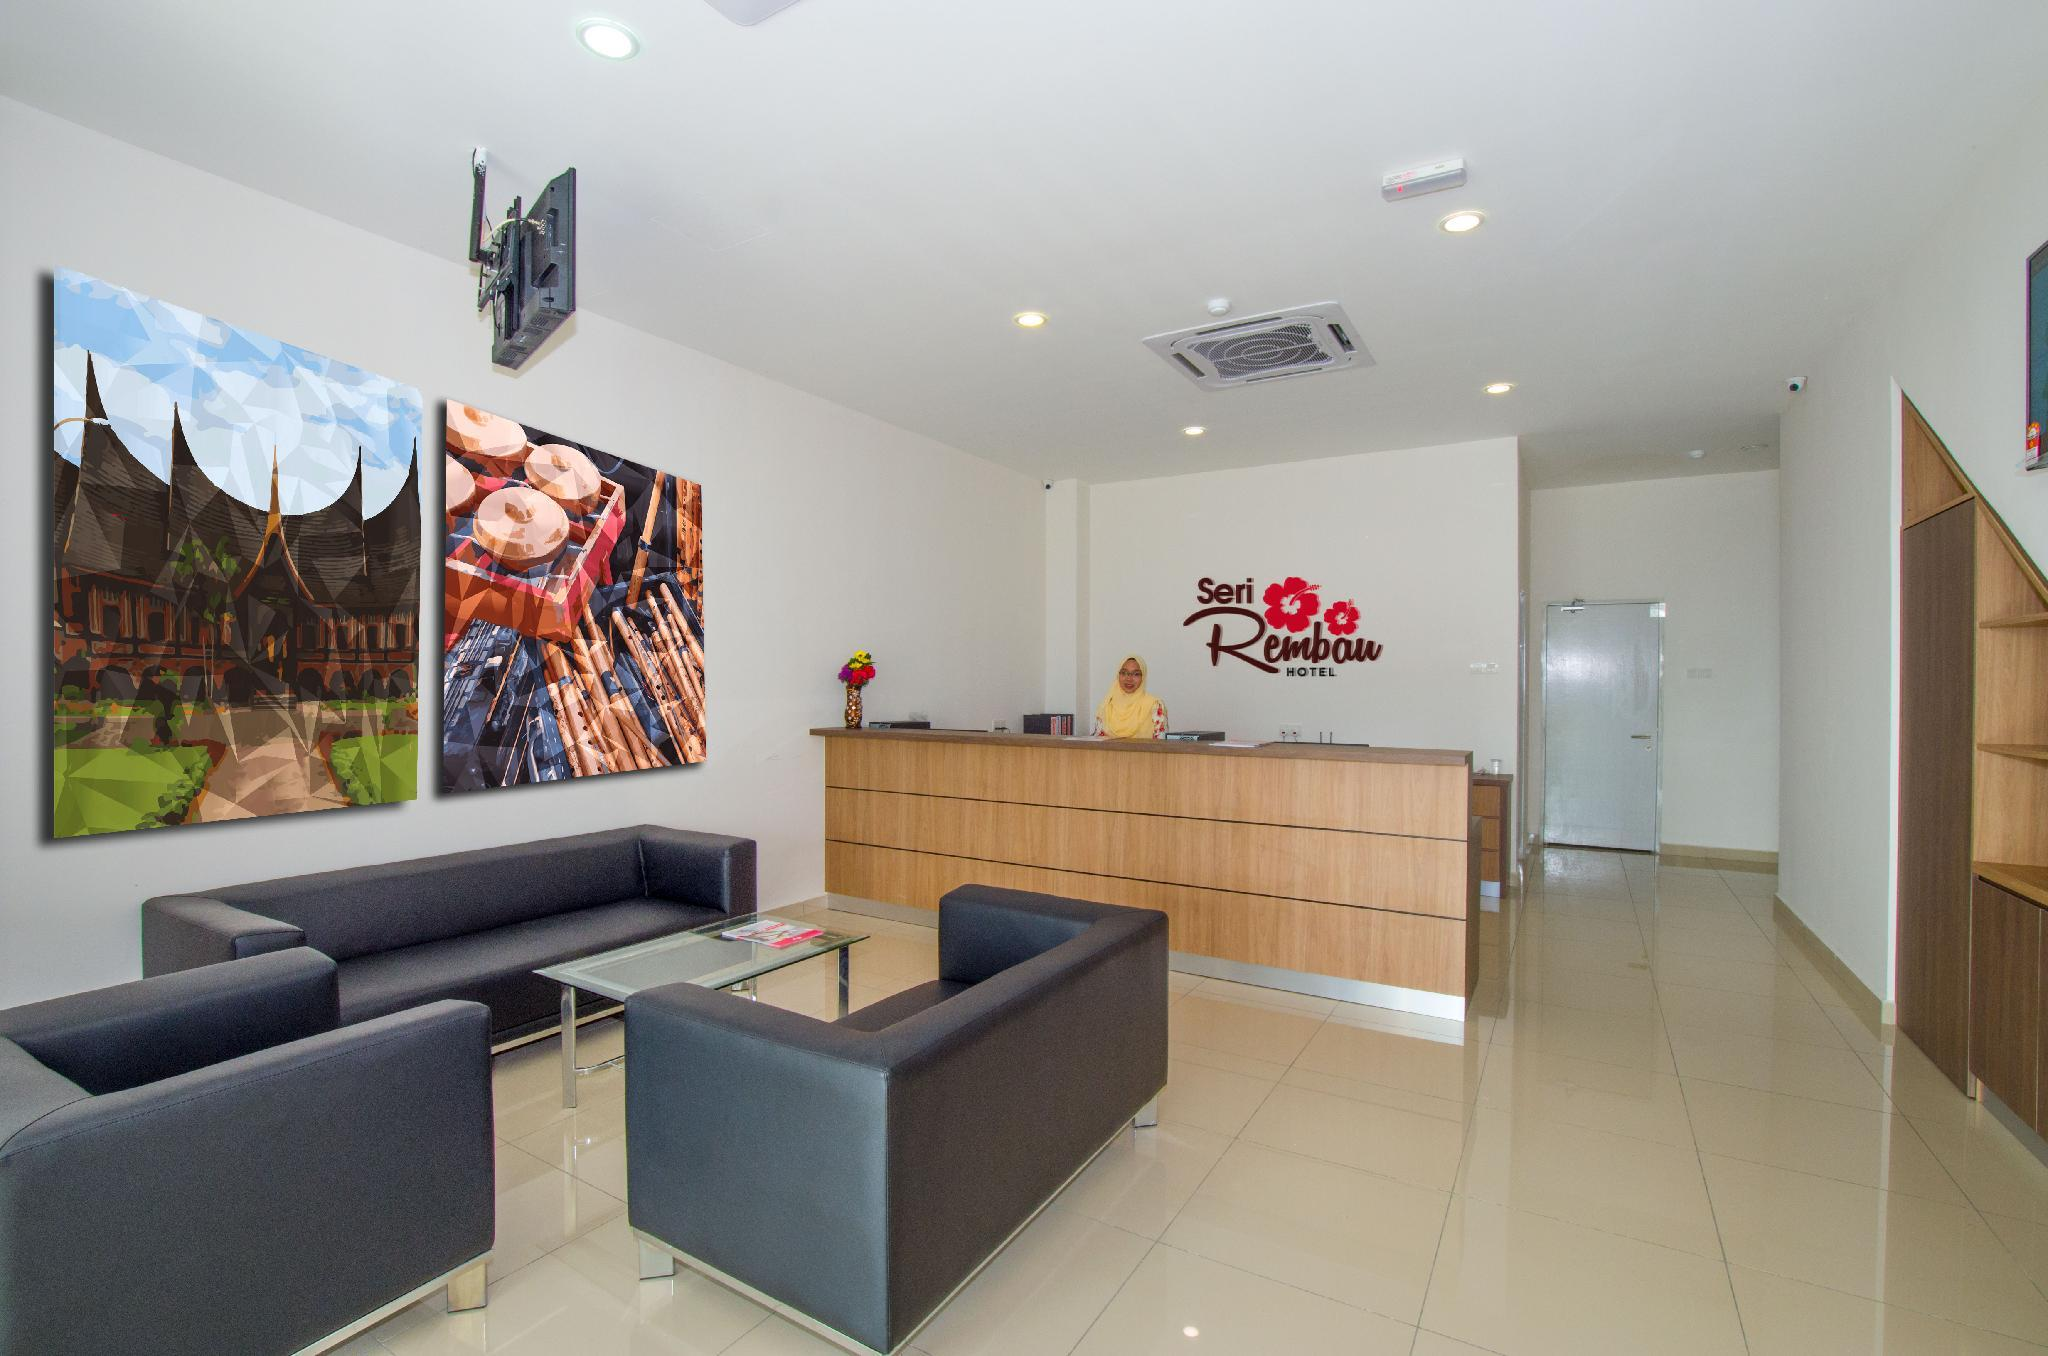 Seri Rembau Hotel